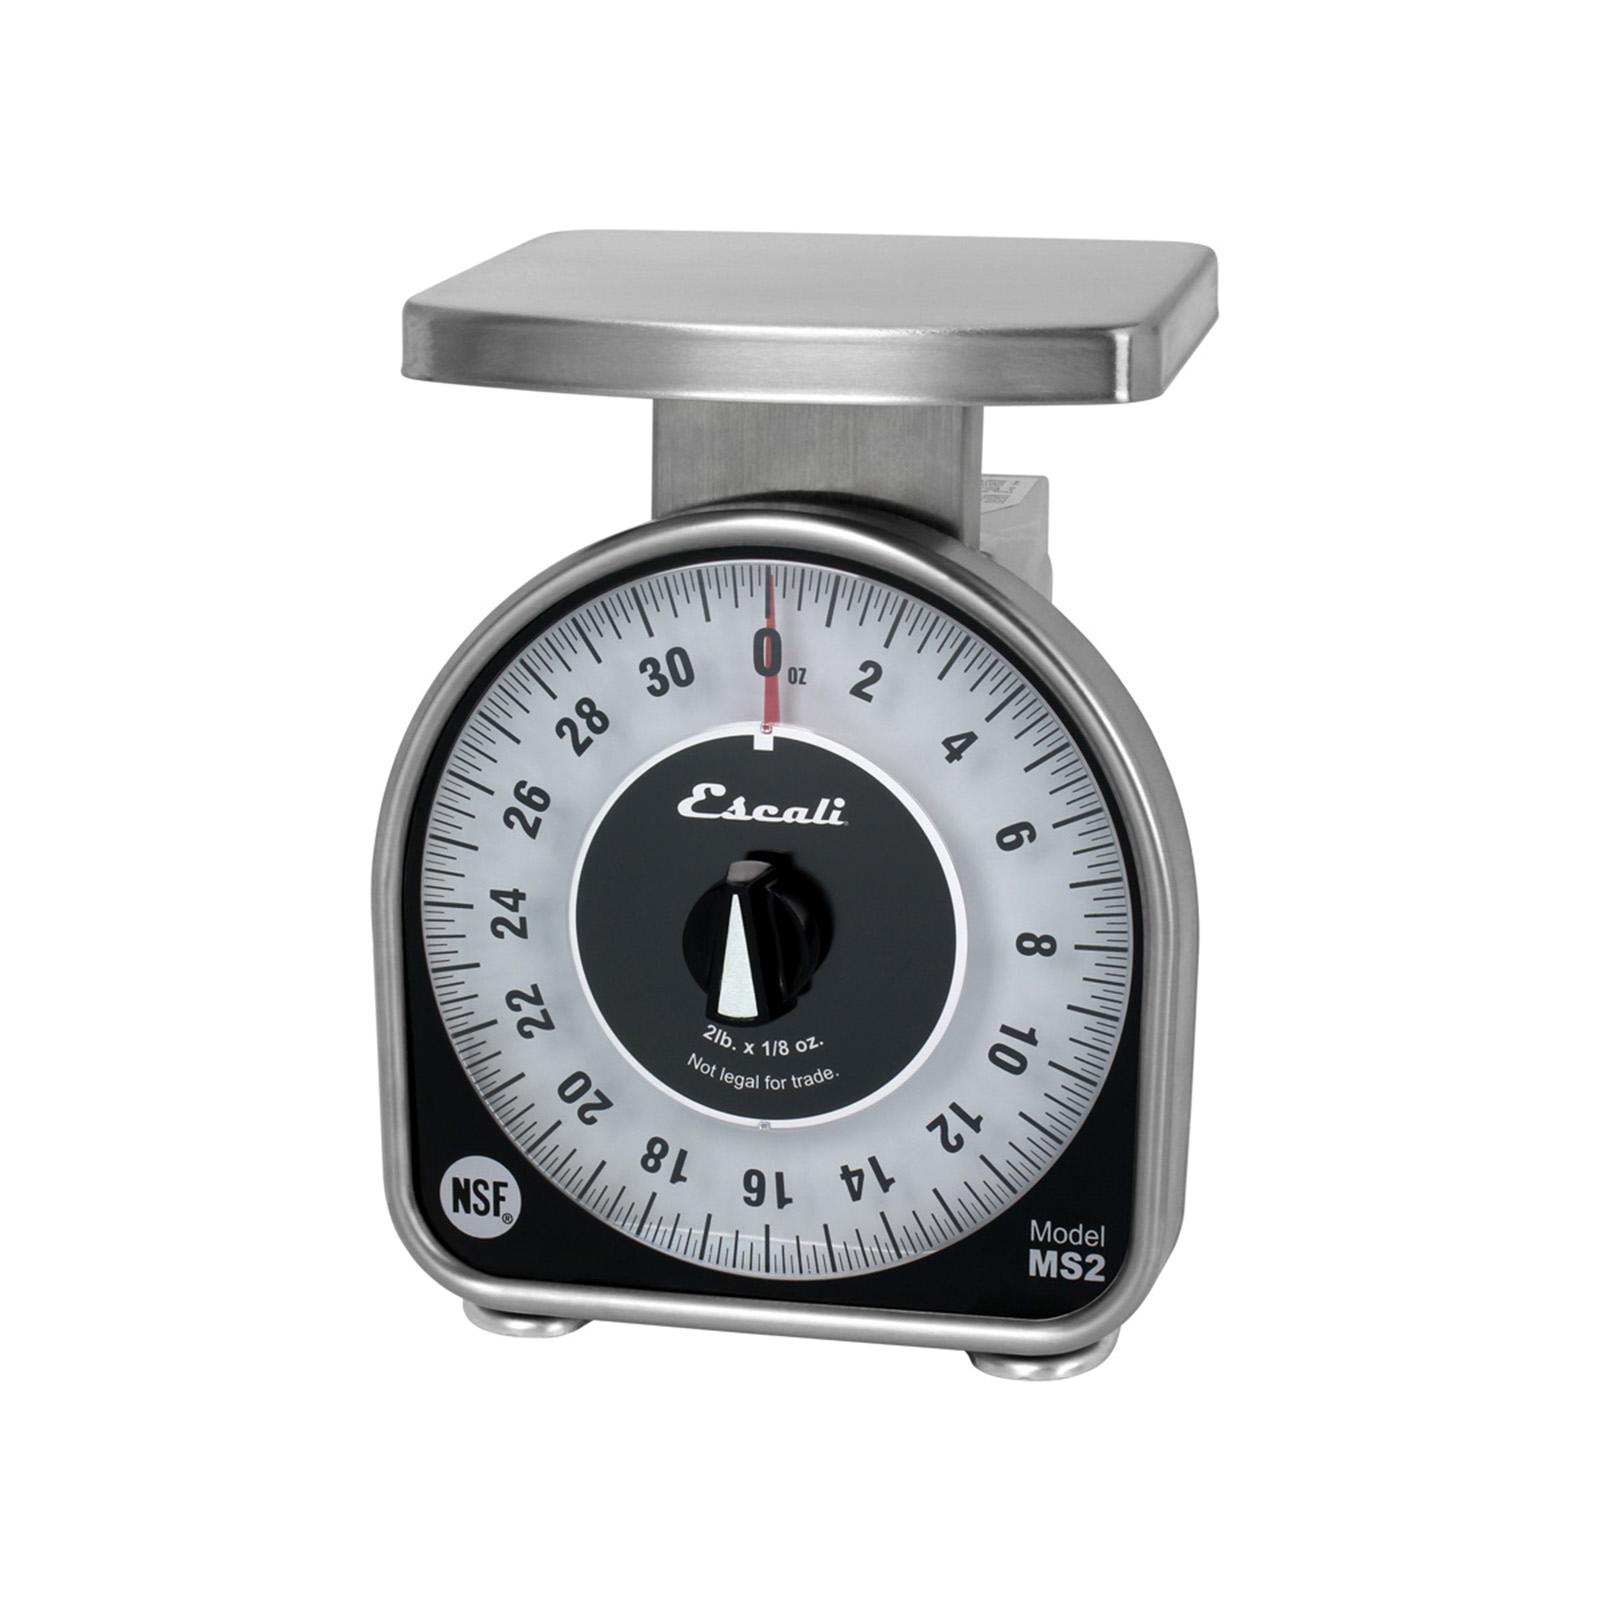 San Jamar SCMDL2 Escali Mechanical Dial Scale 2lb - 4 5/8